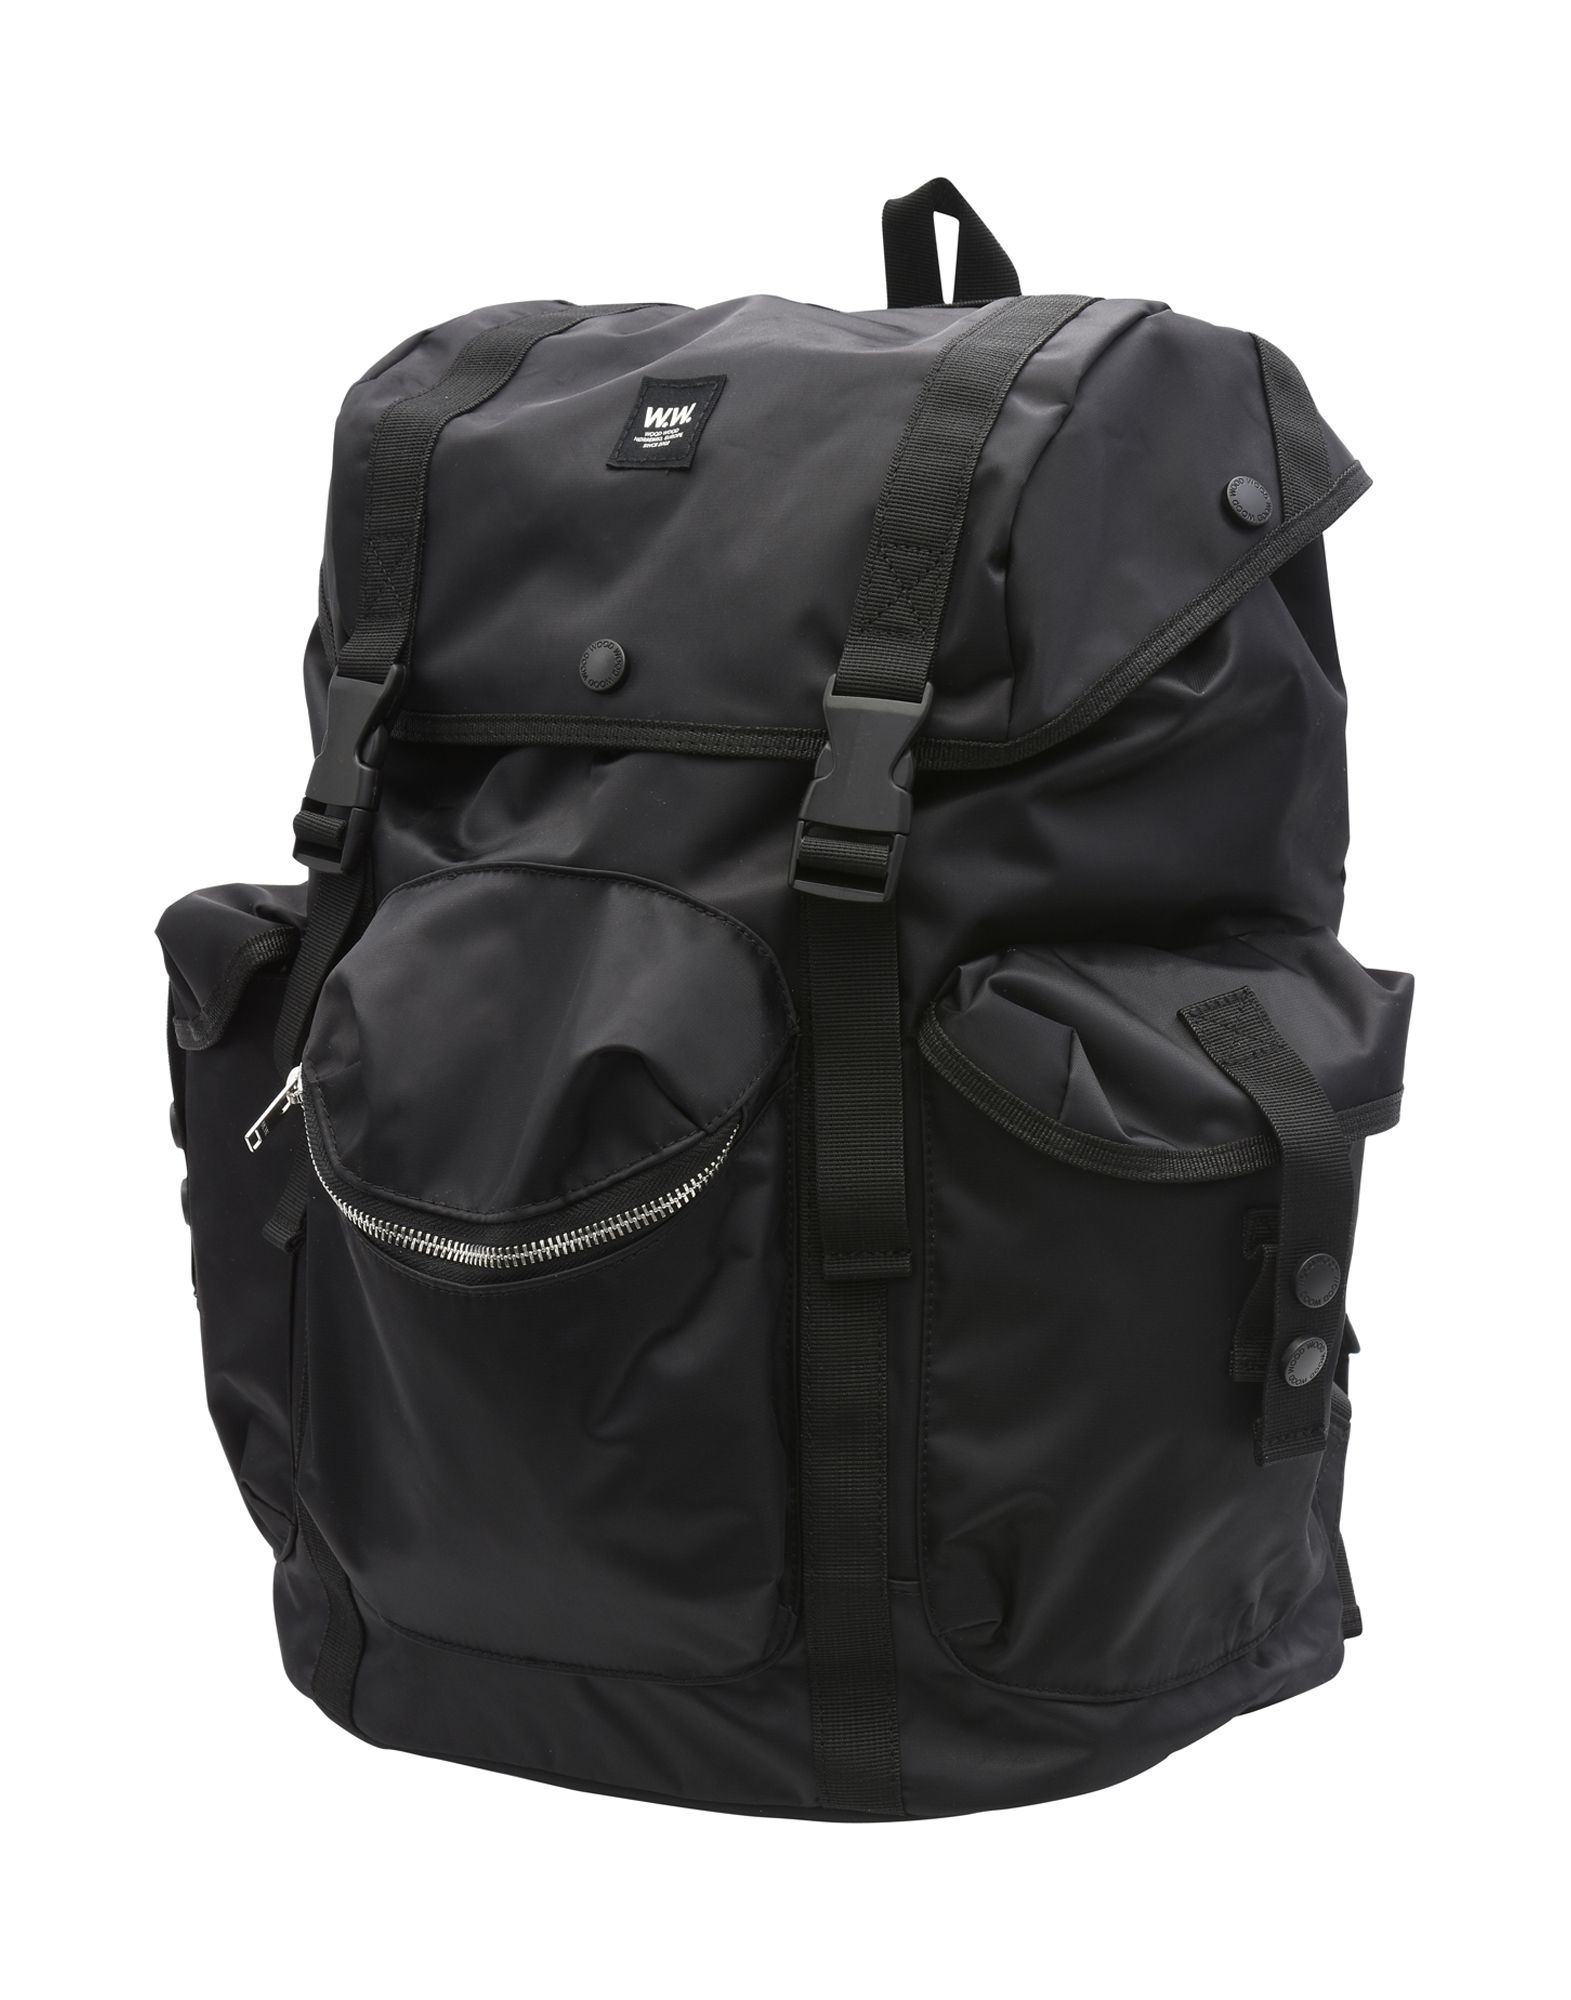 Zaini & Marsupi Wood Wood Mills Backpack Accessories - Uomo - Acquista online su